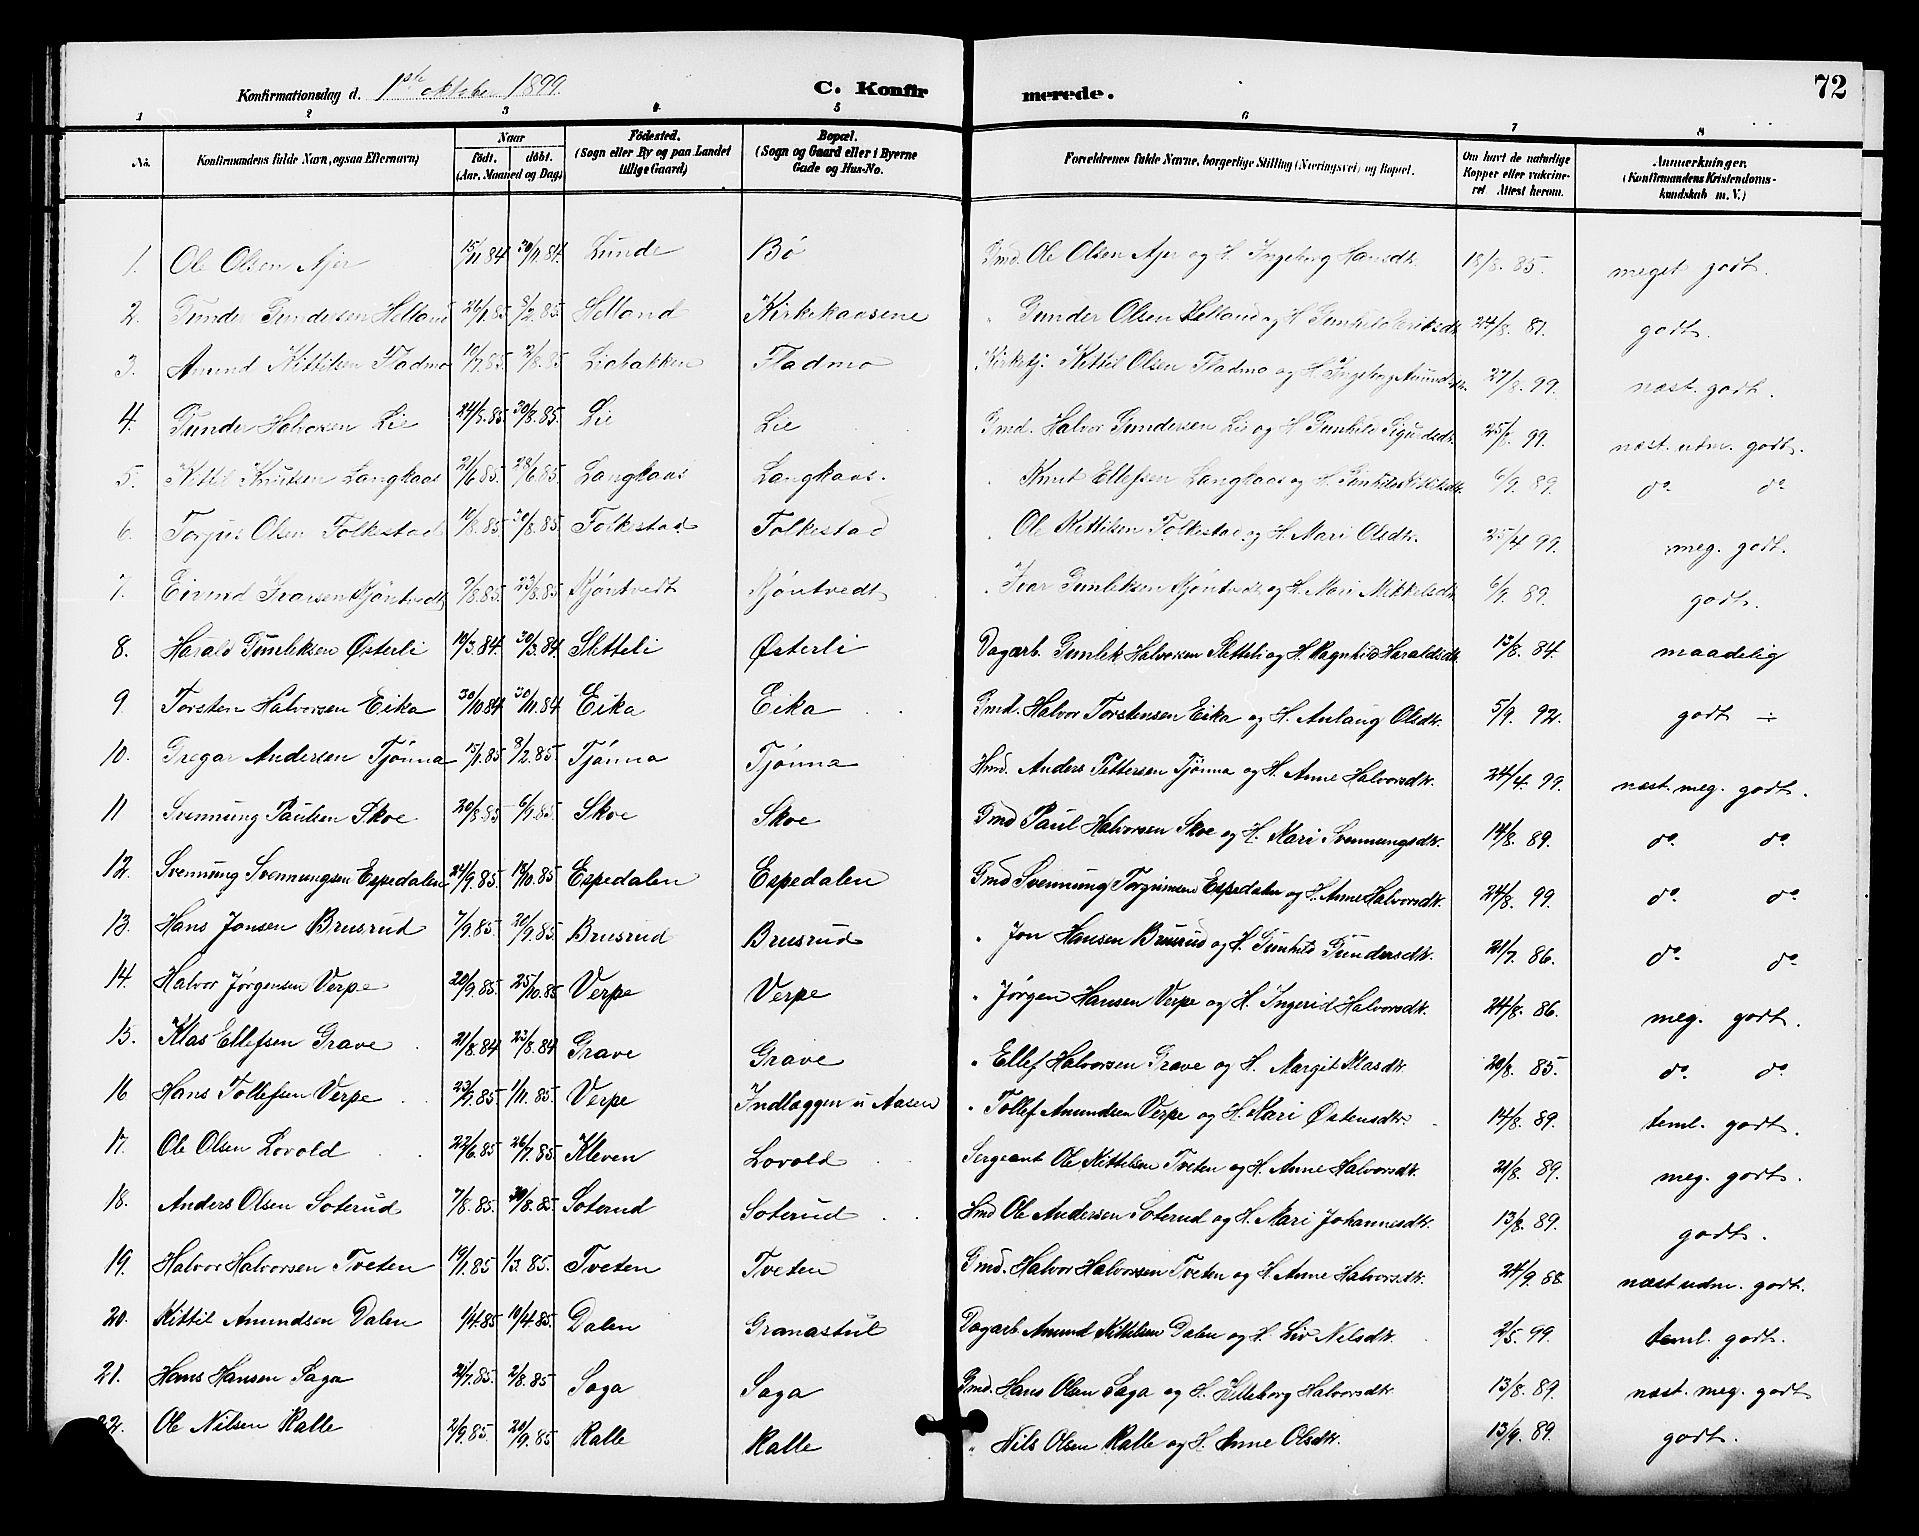 SAKO, Bø kirkebøker, G/Ga/L0006: Klokkerbok nr. 6, 1898-1909, s. 72